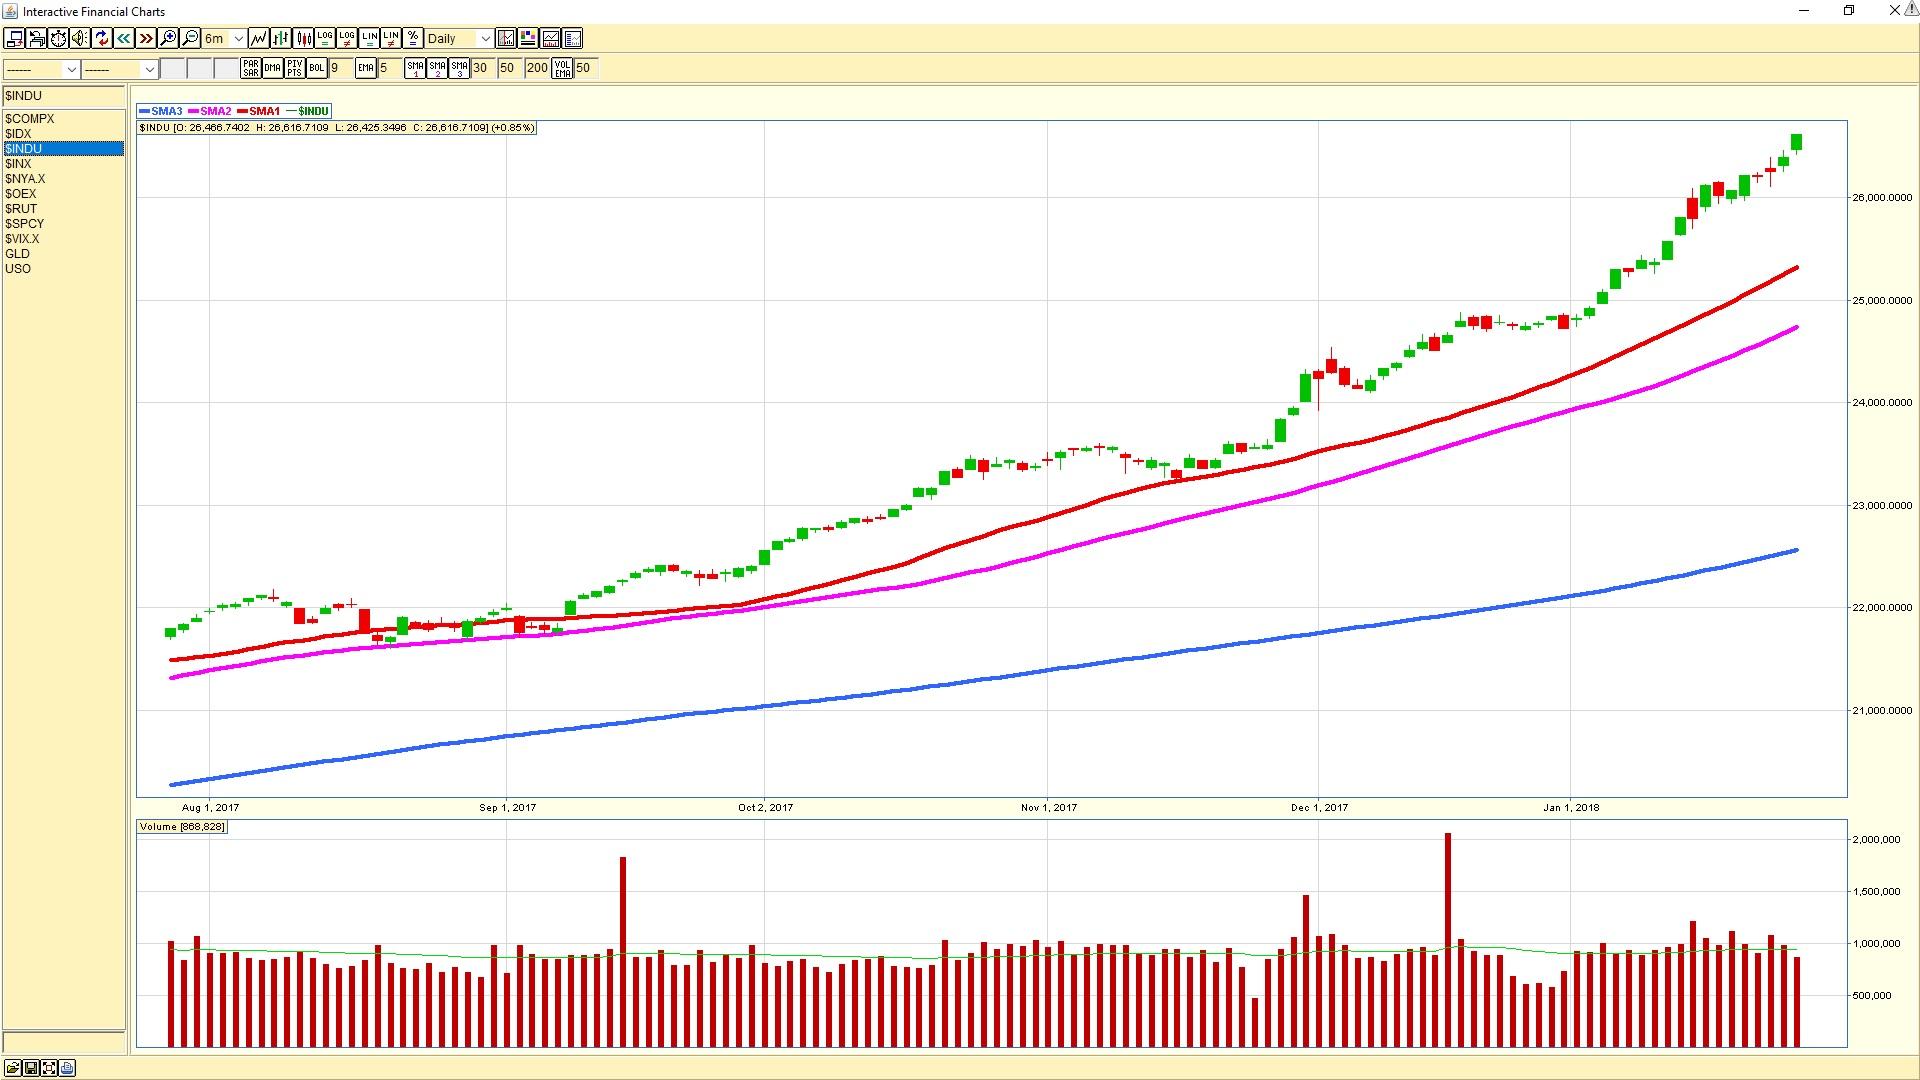 Dow Jones Industrial Average daily chart 20180126